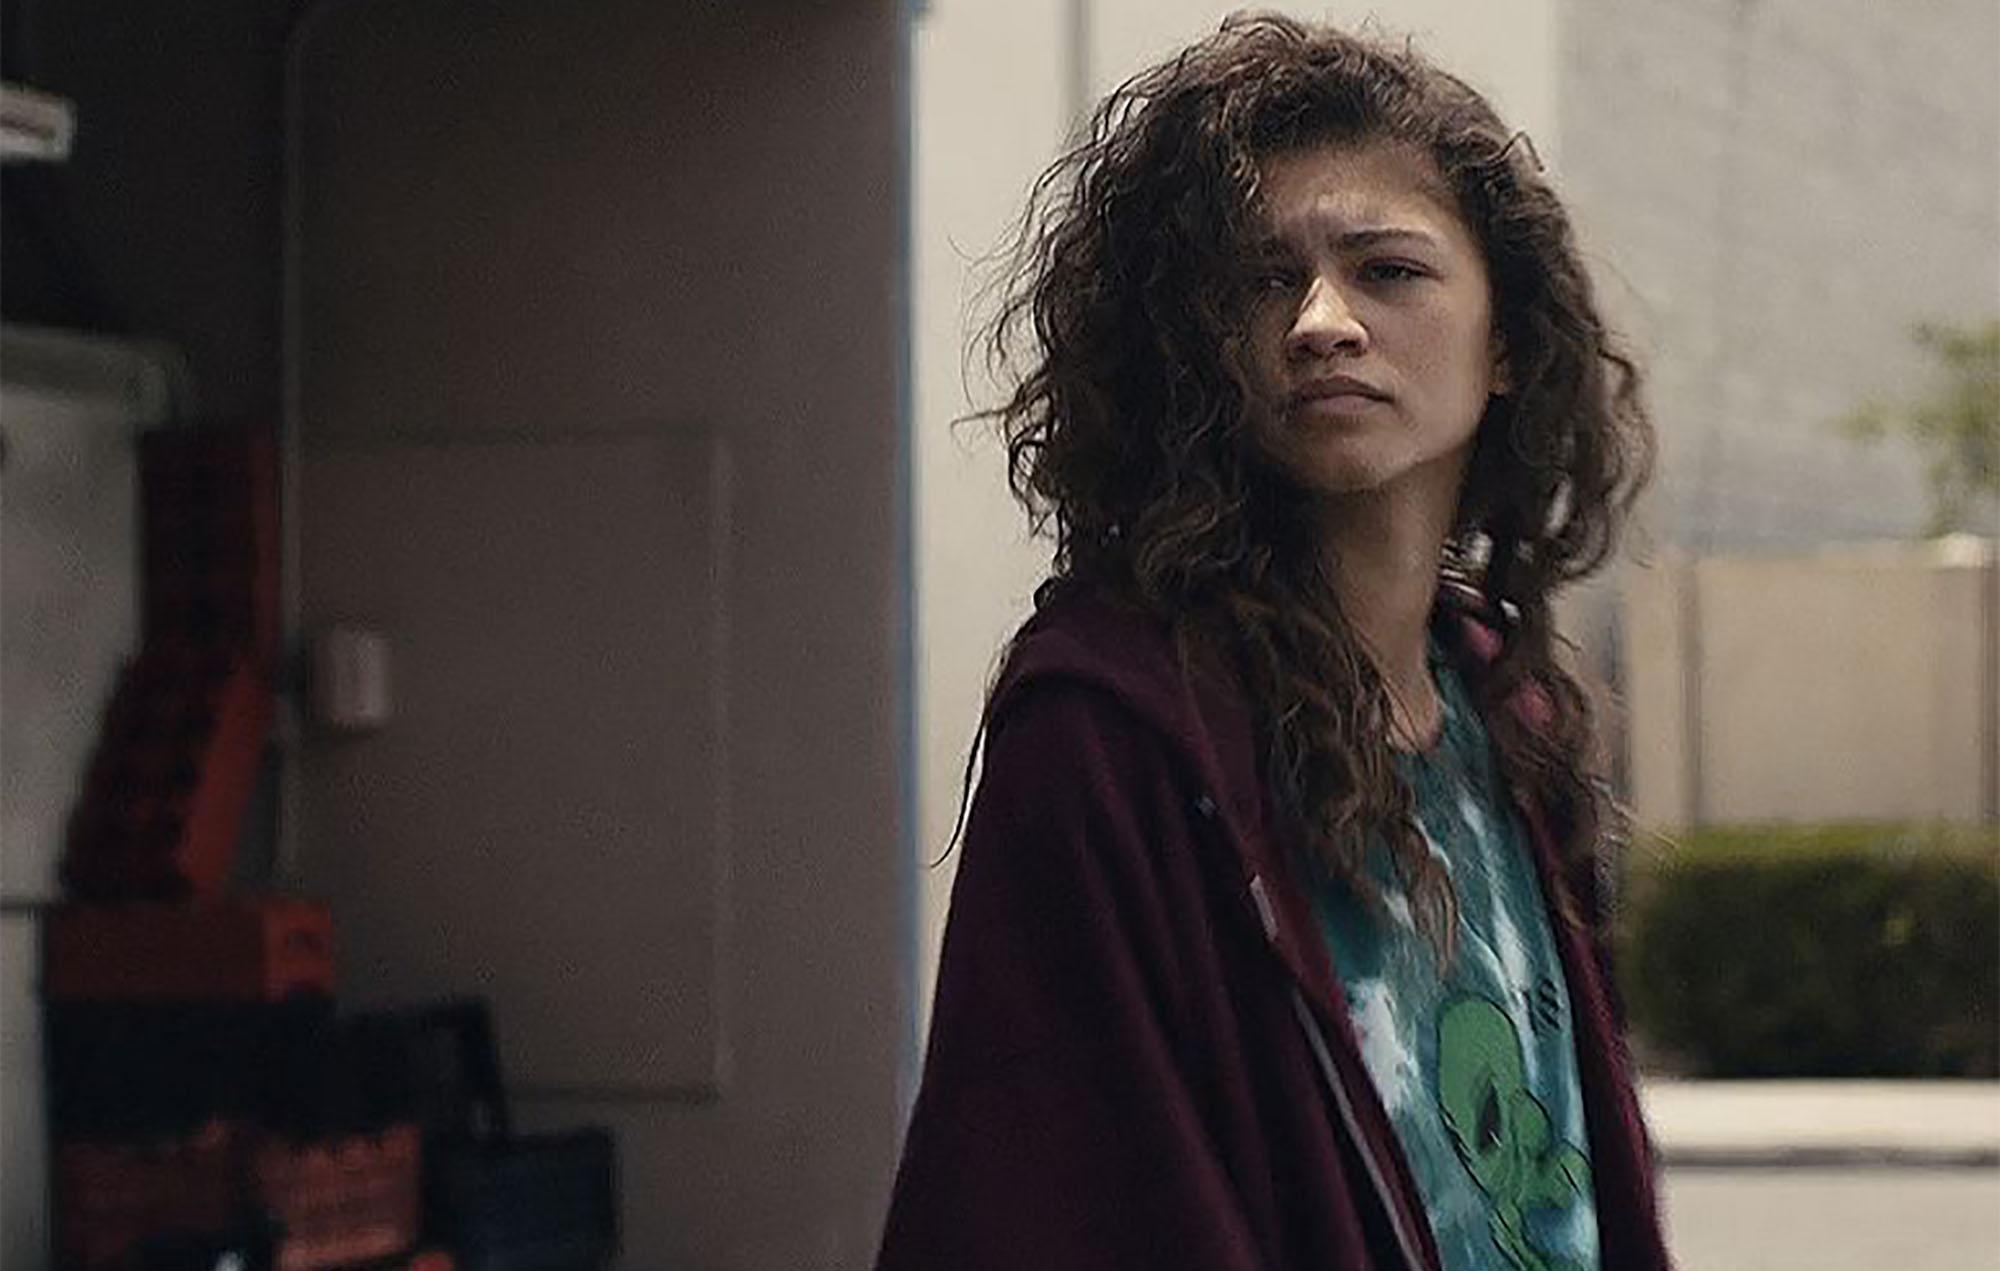 Coronavirus: Zendaya's 'Euphoria' hoodie for sale in an A24 charity auction